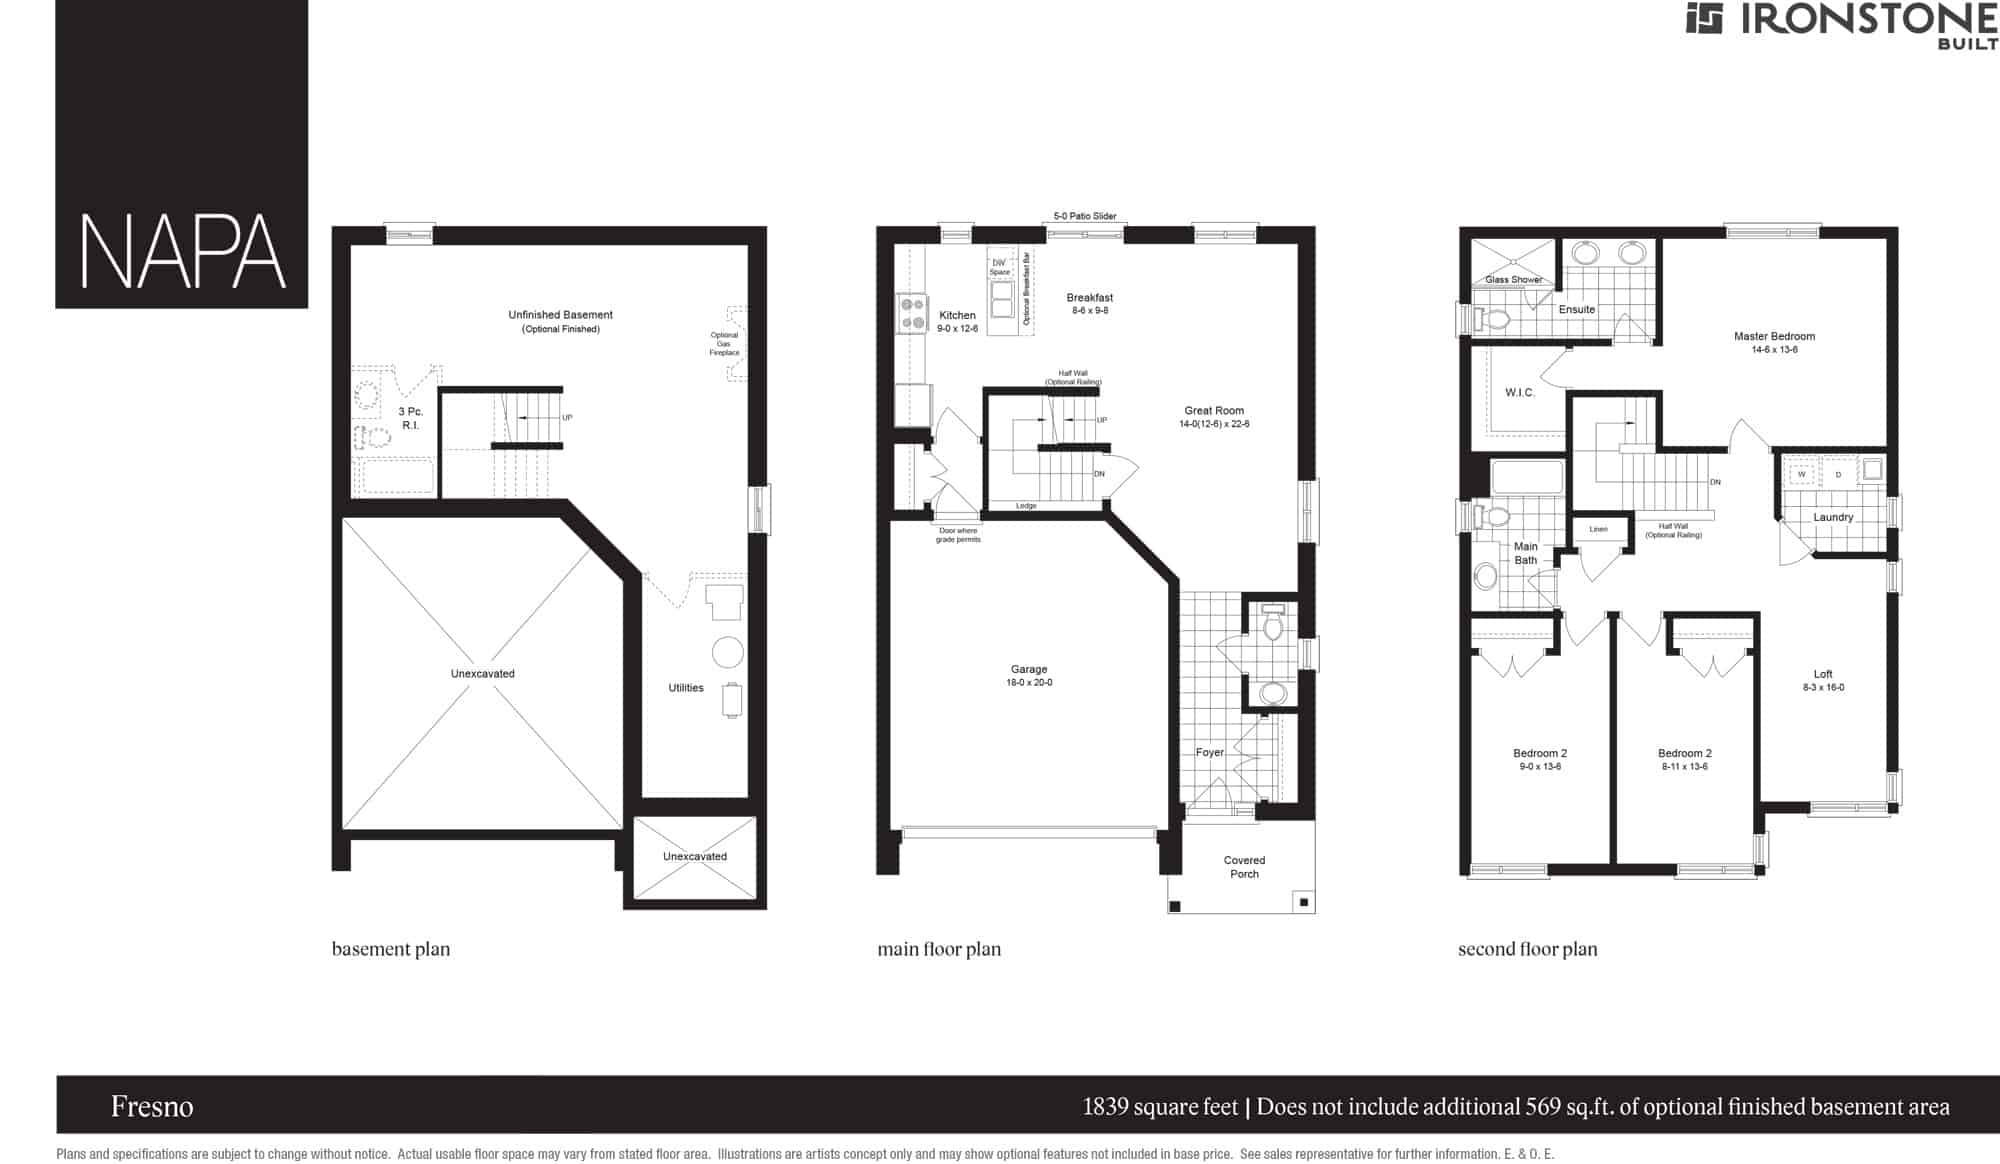 Fresno Single Home London Ontario Floor Plan